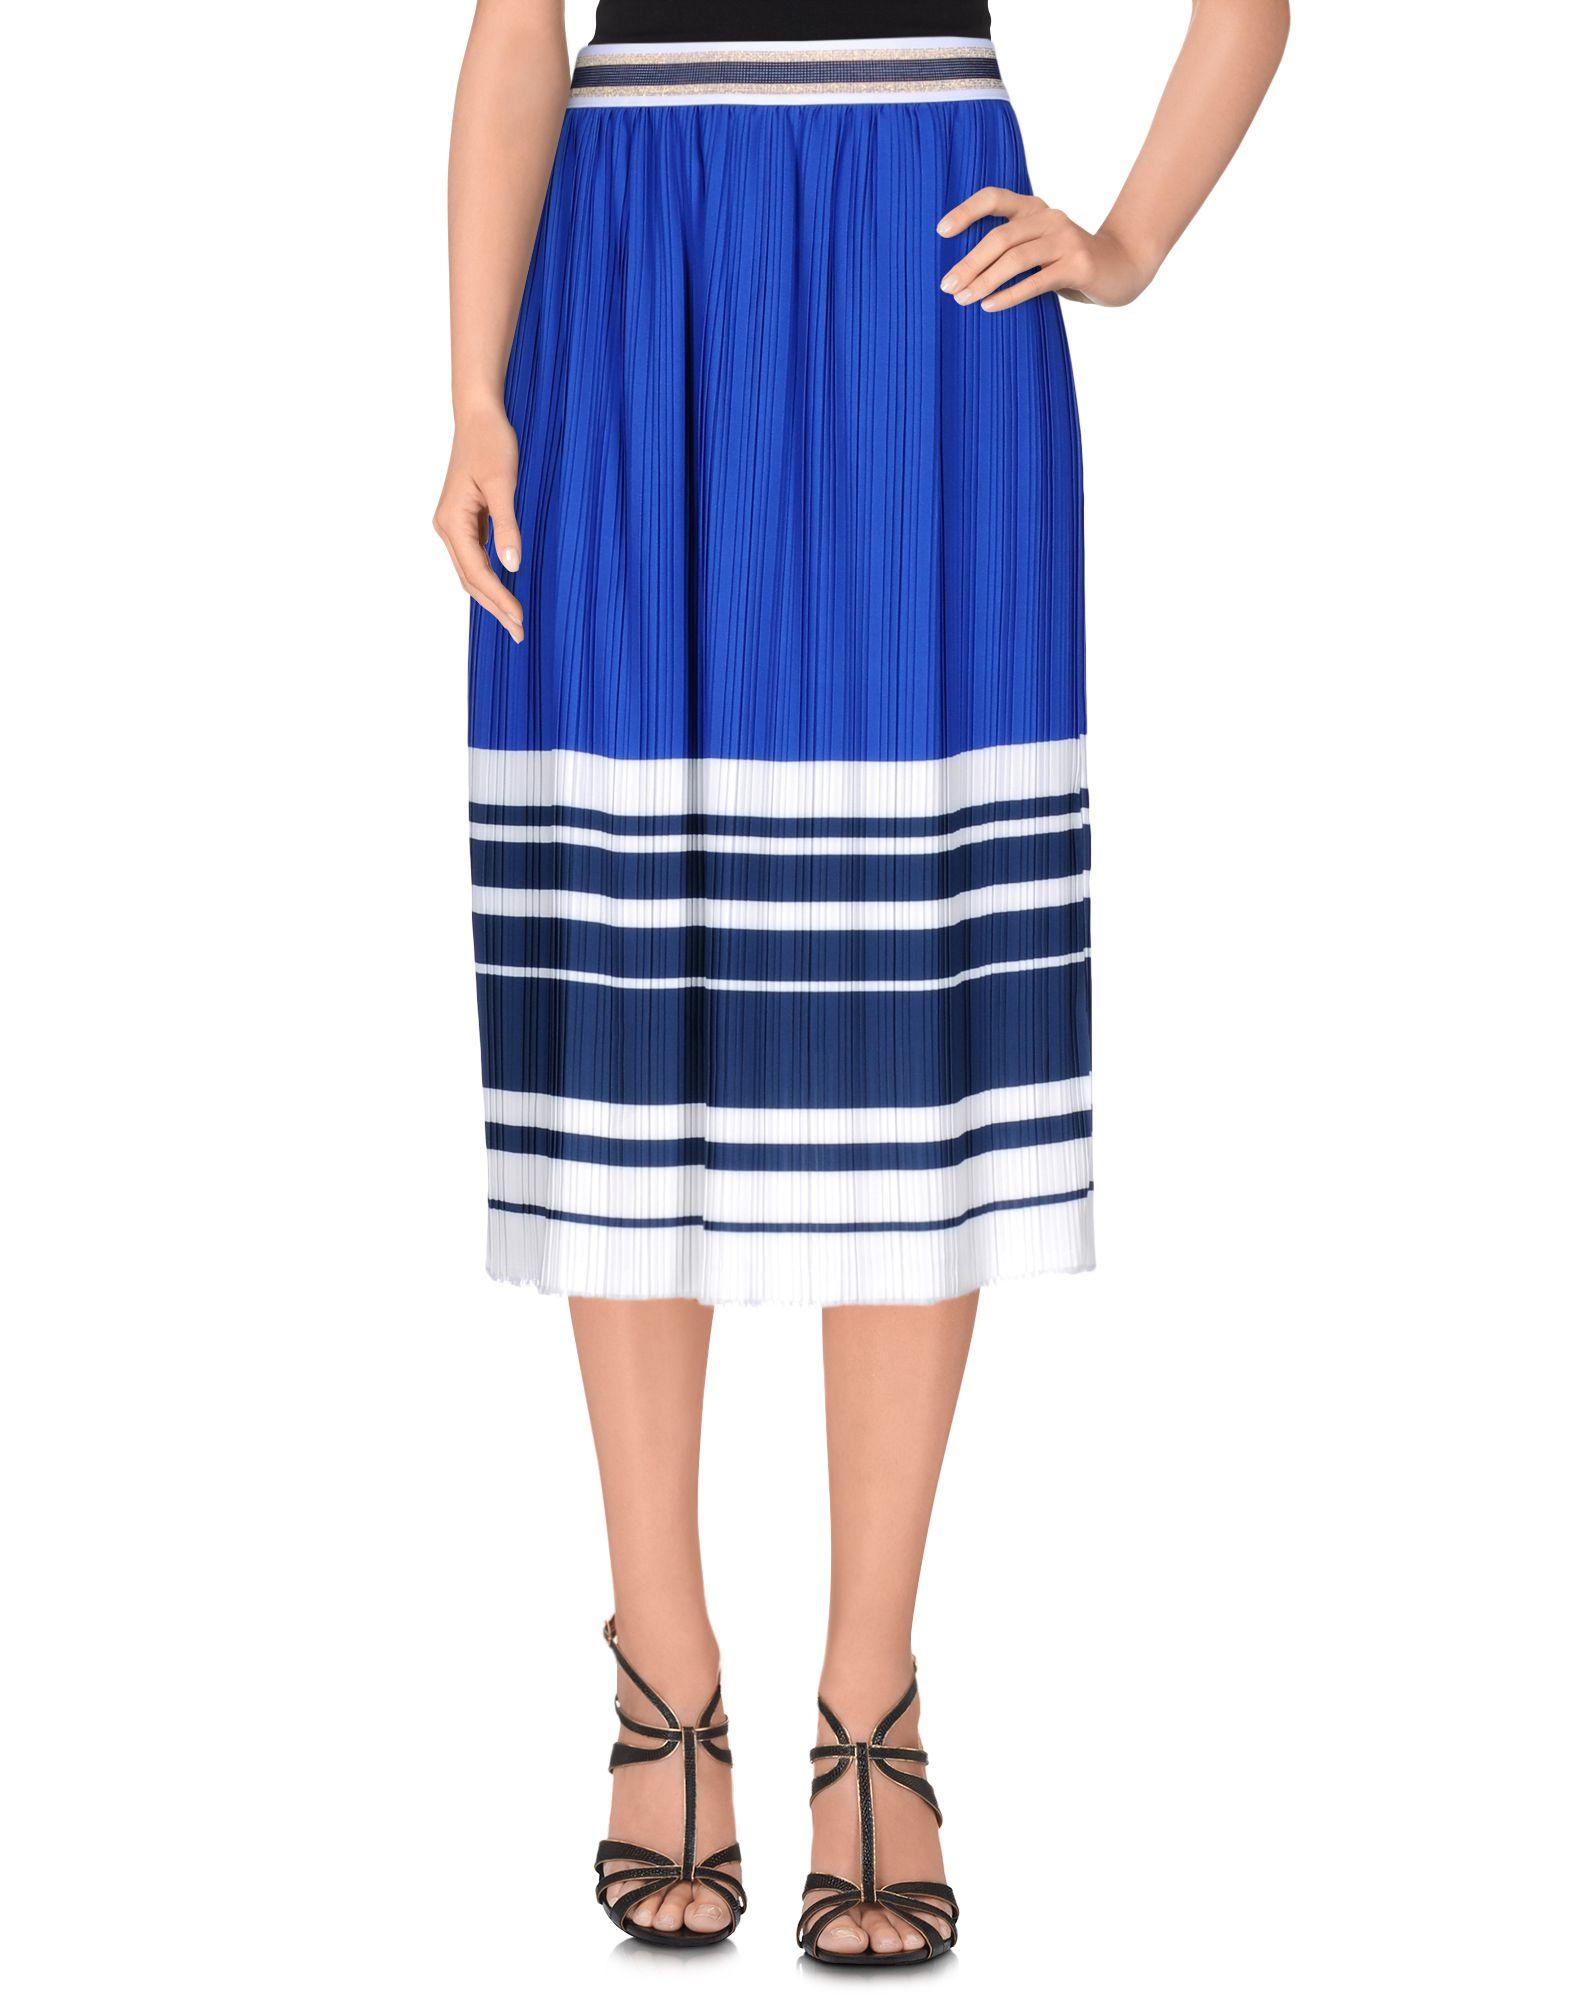 souvenir female souvenir 34 length skirts